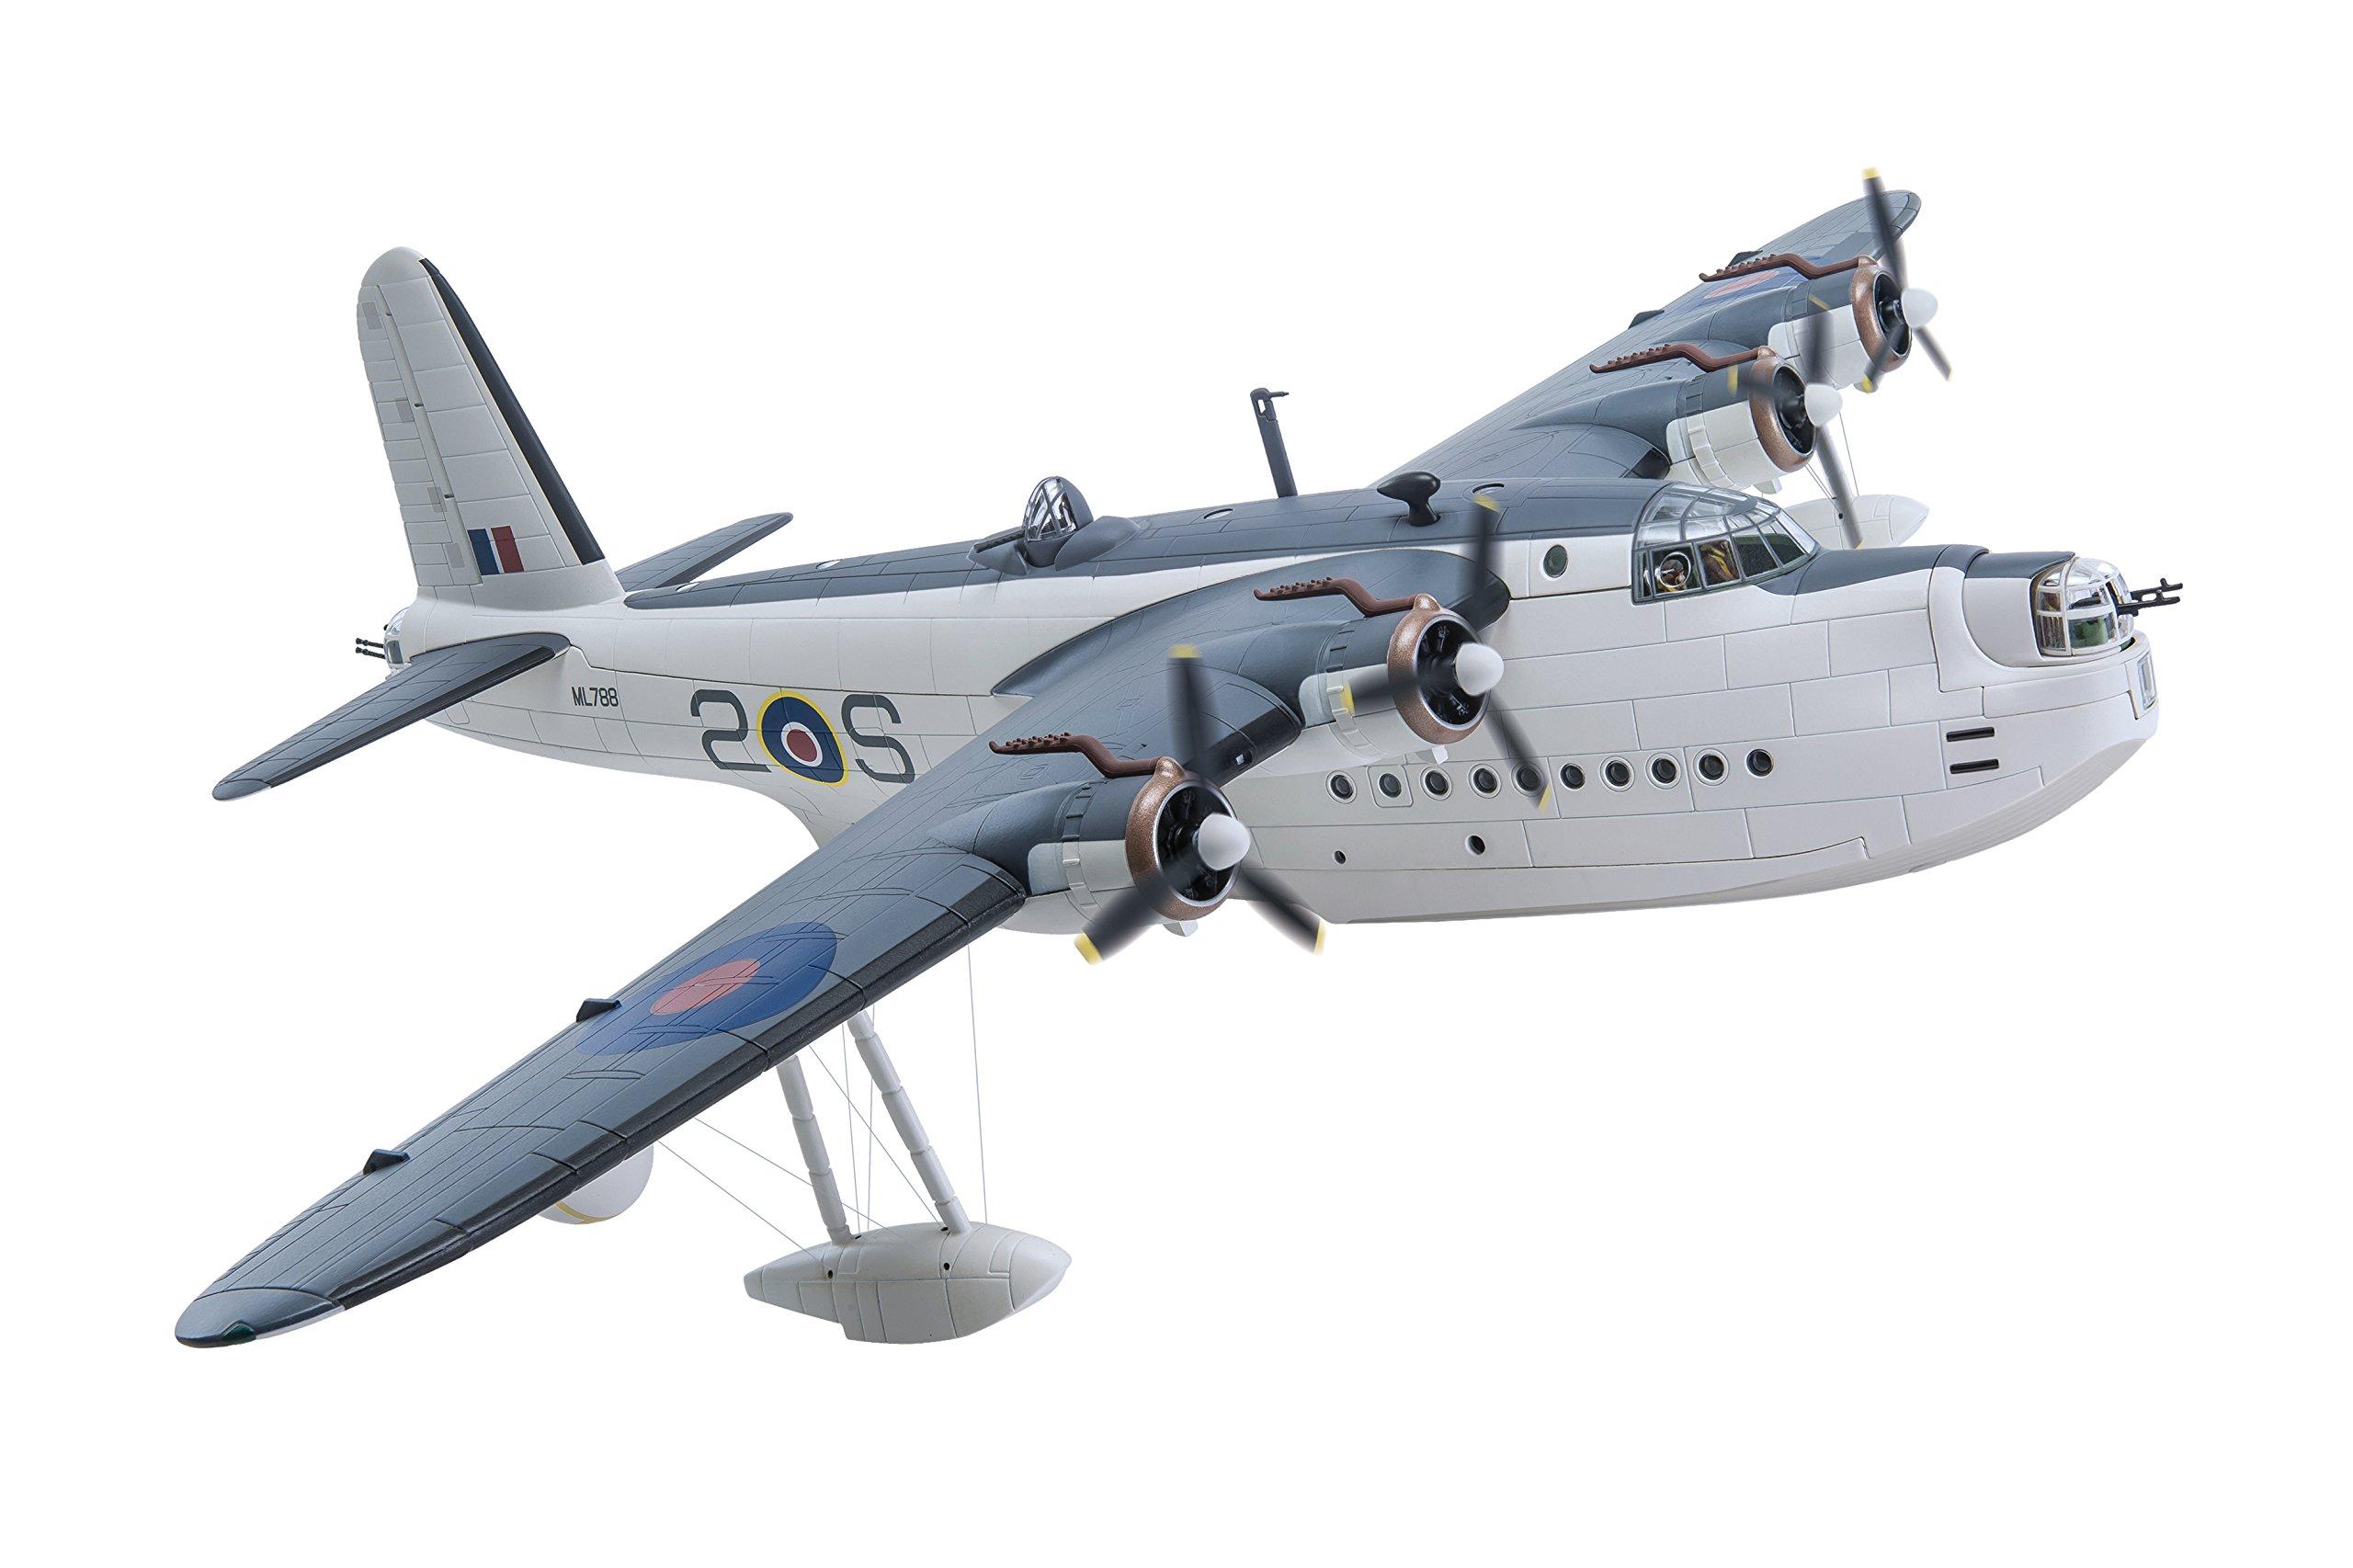 Corgi Short Sunderland Mk III Diecast Aviation Archive Model Replica by Corgi (Image #1)